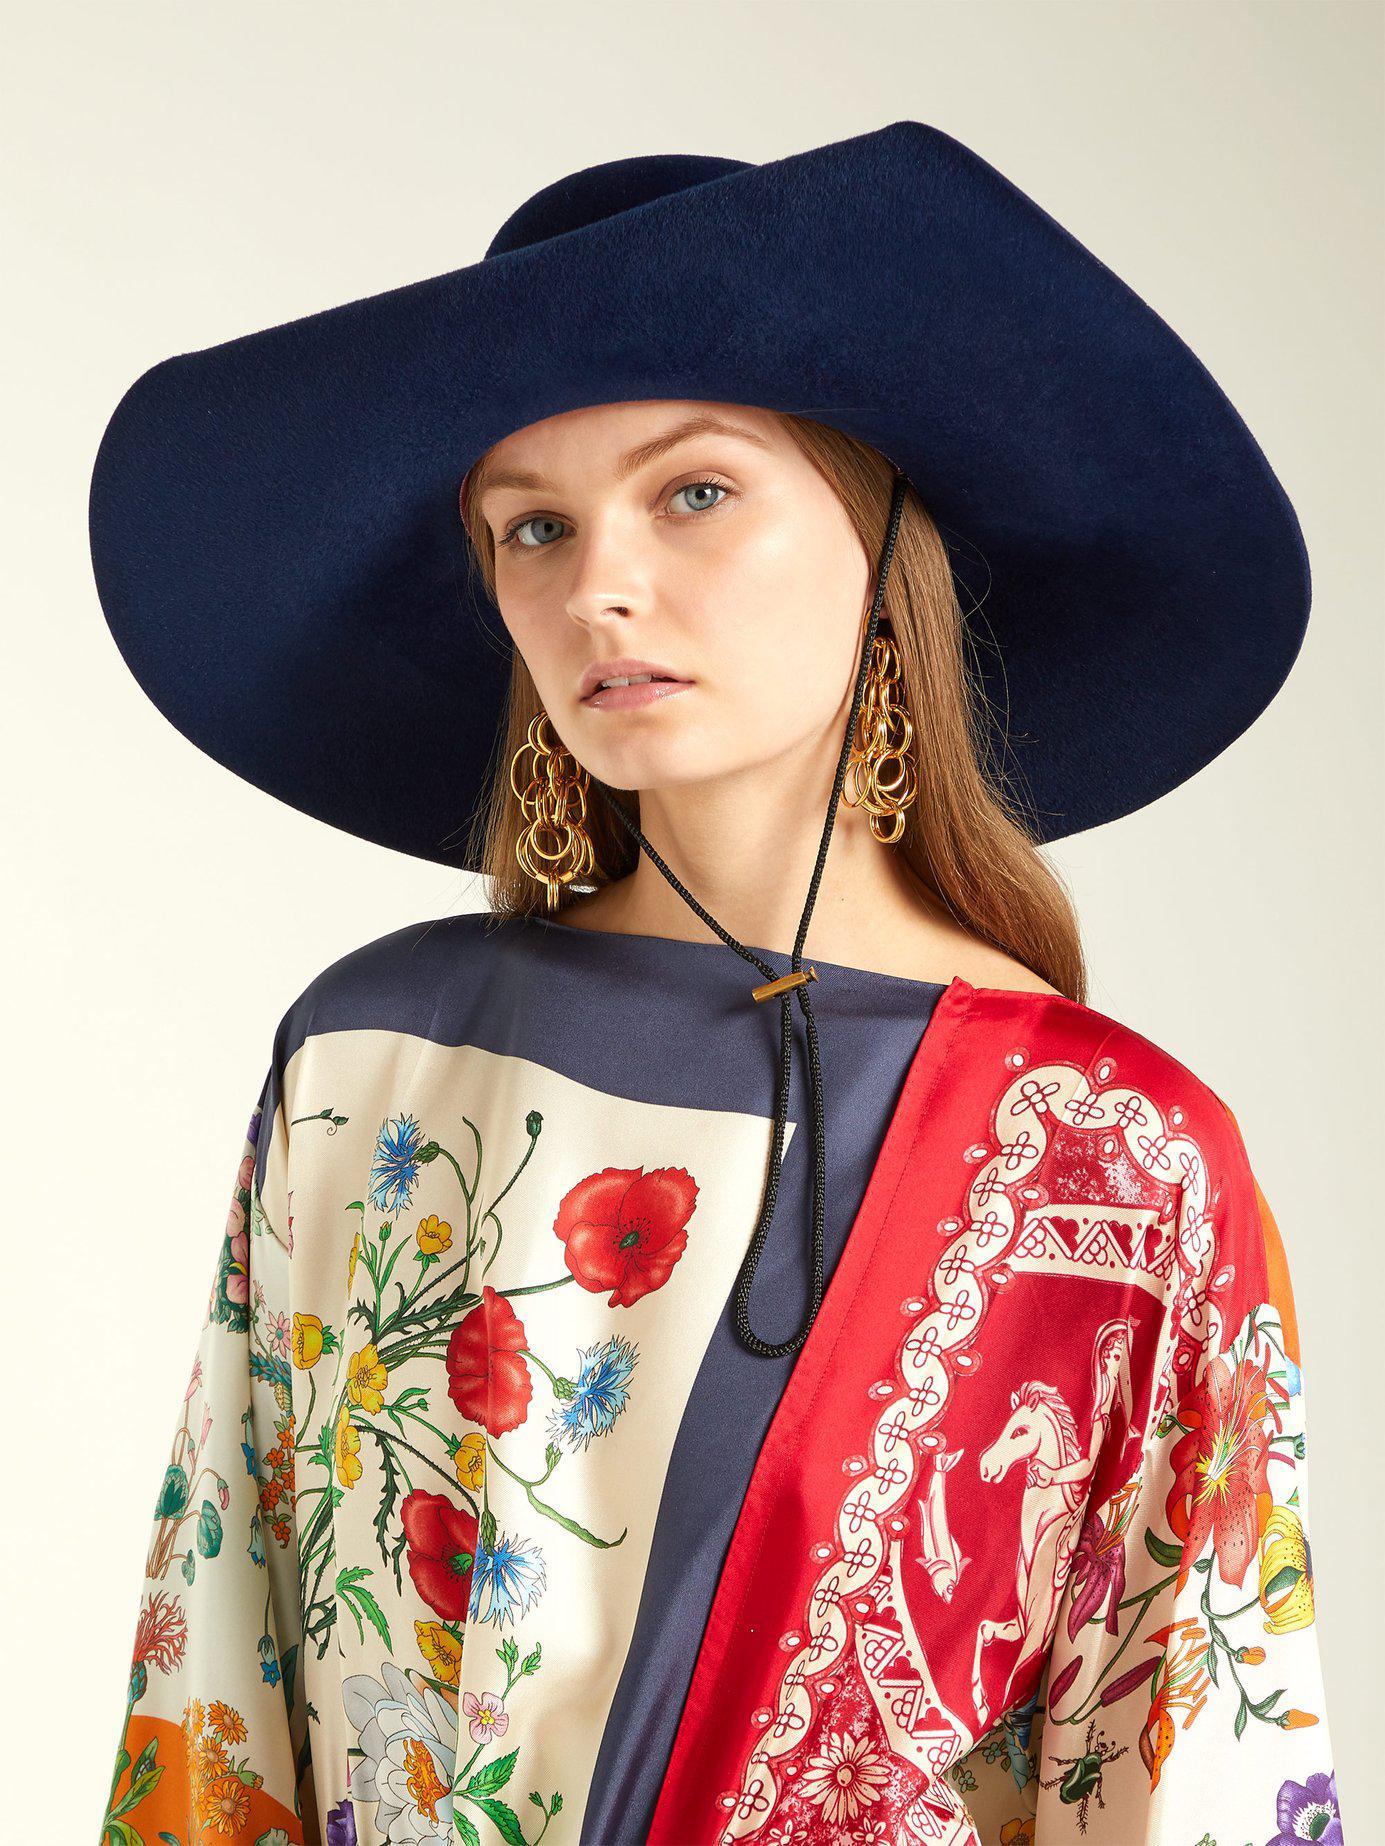 e03a1722c11a1 Lyst - Gucci Aria Flower Appliqué Felt Hat in Blue